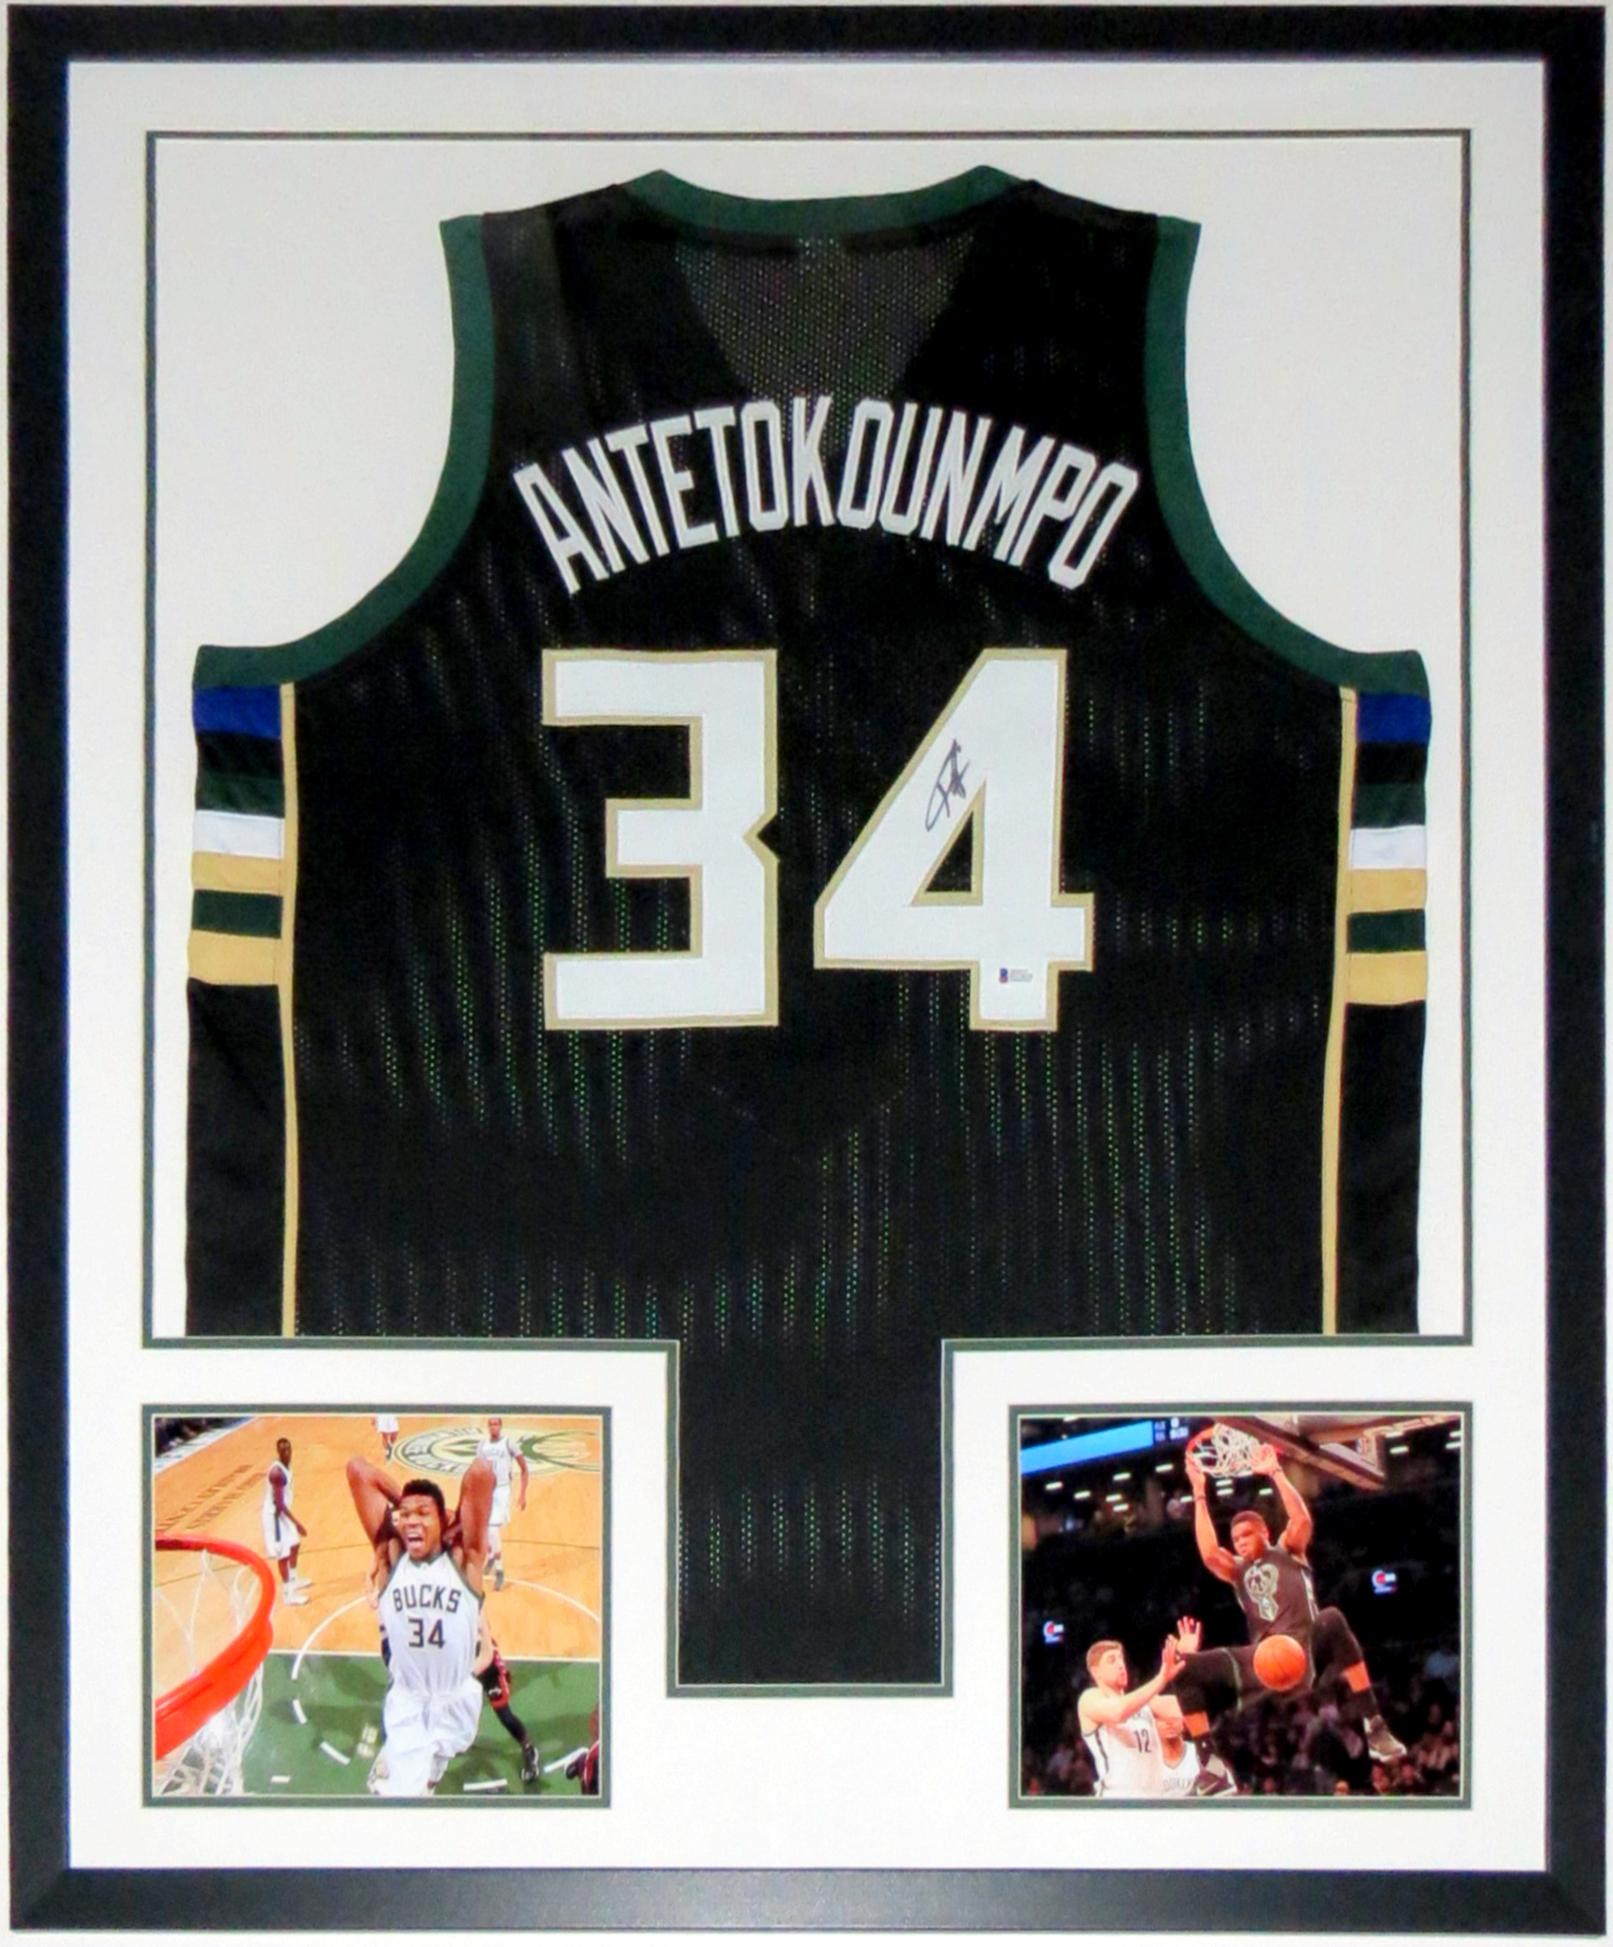 Giannis Antetokounmpo Signed Nike Milwaukee Bucks Jersey - Beckett BAS COA Authenticated - Professionally Framed & 8x10 Photo